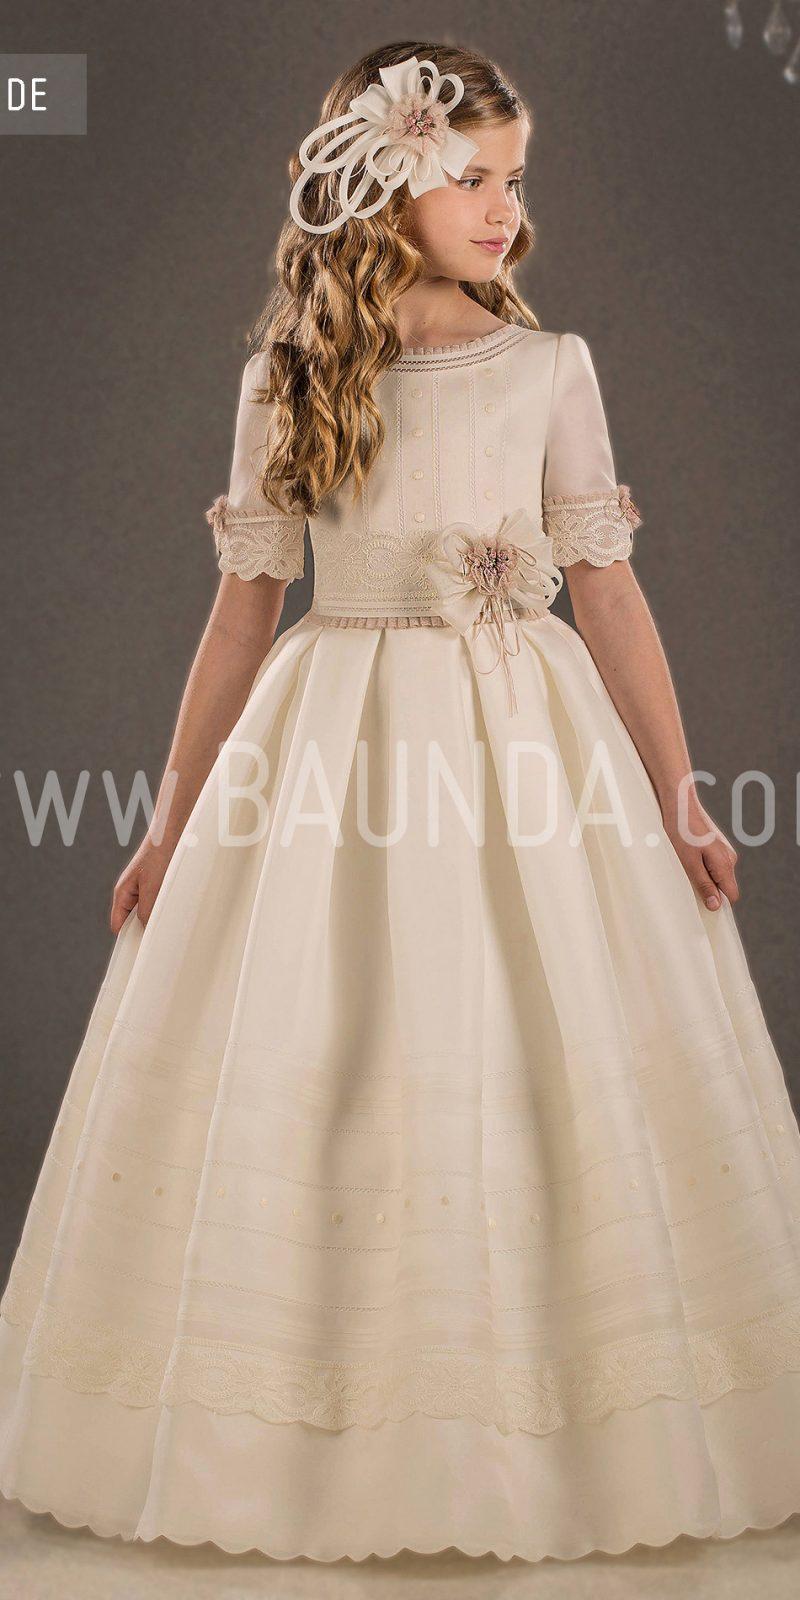 Baunda silk communion dress valeria 2018 model duende - Traje de duende para nino ...